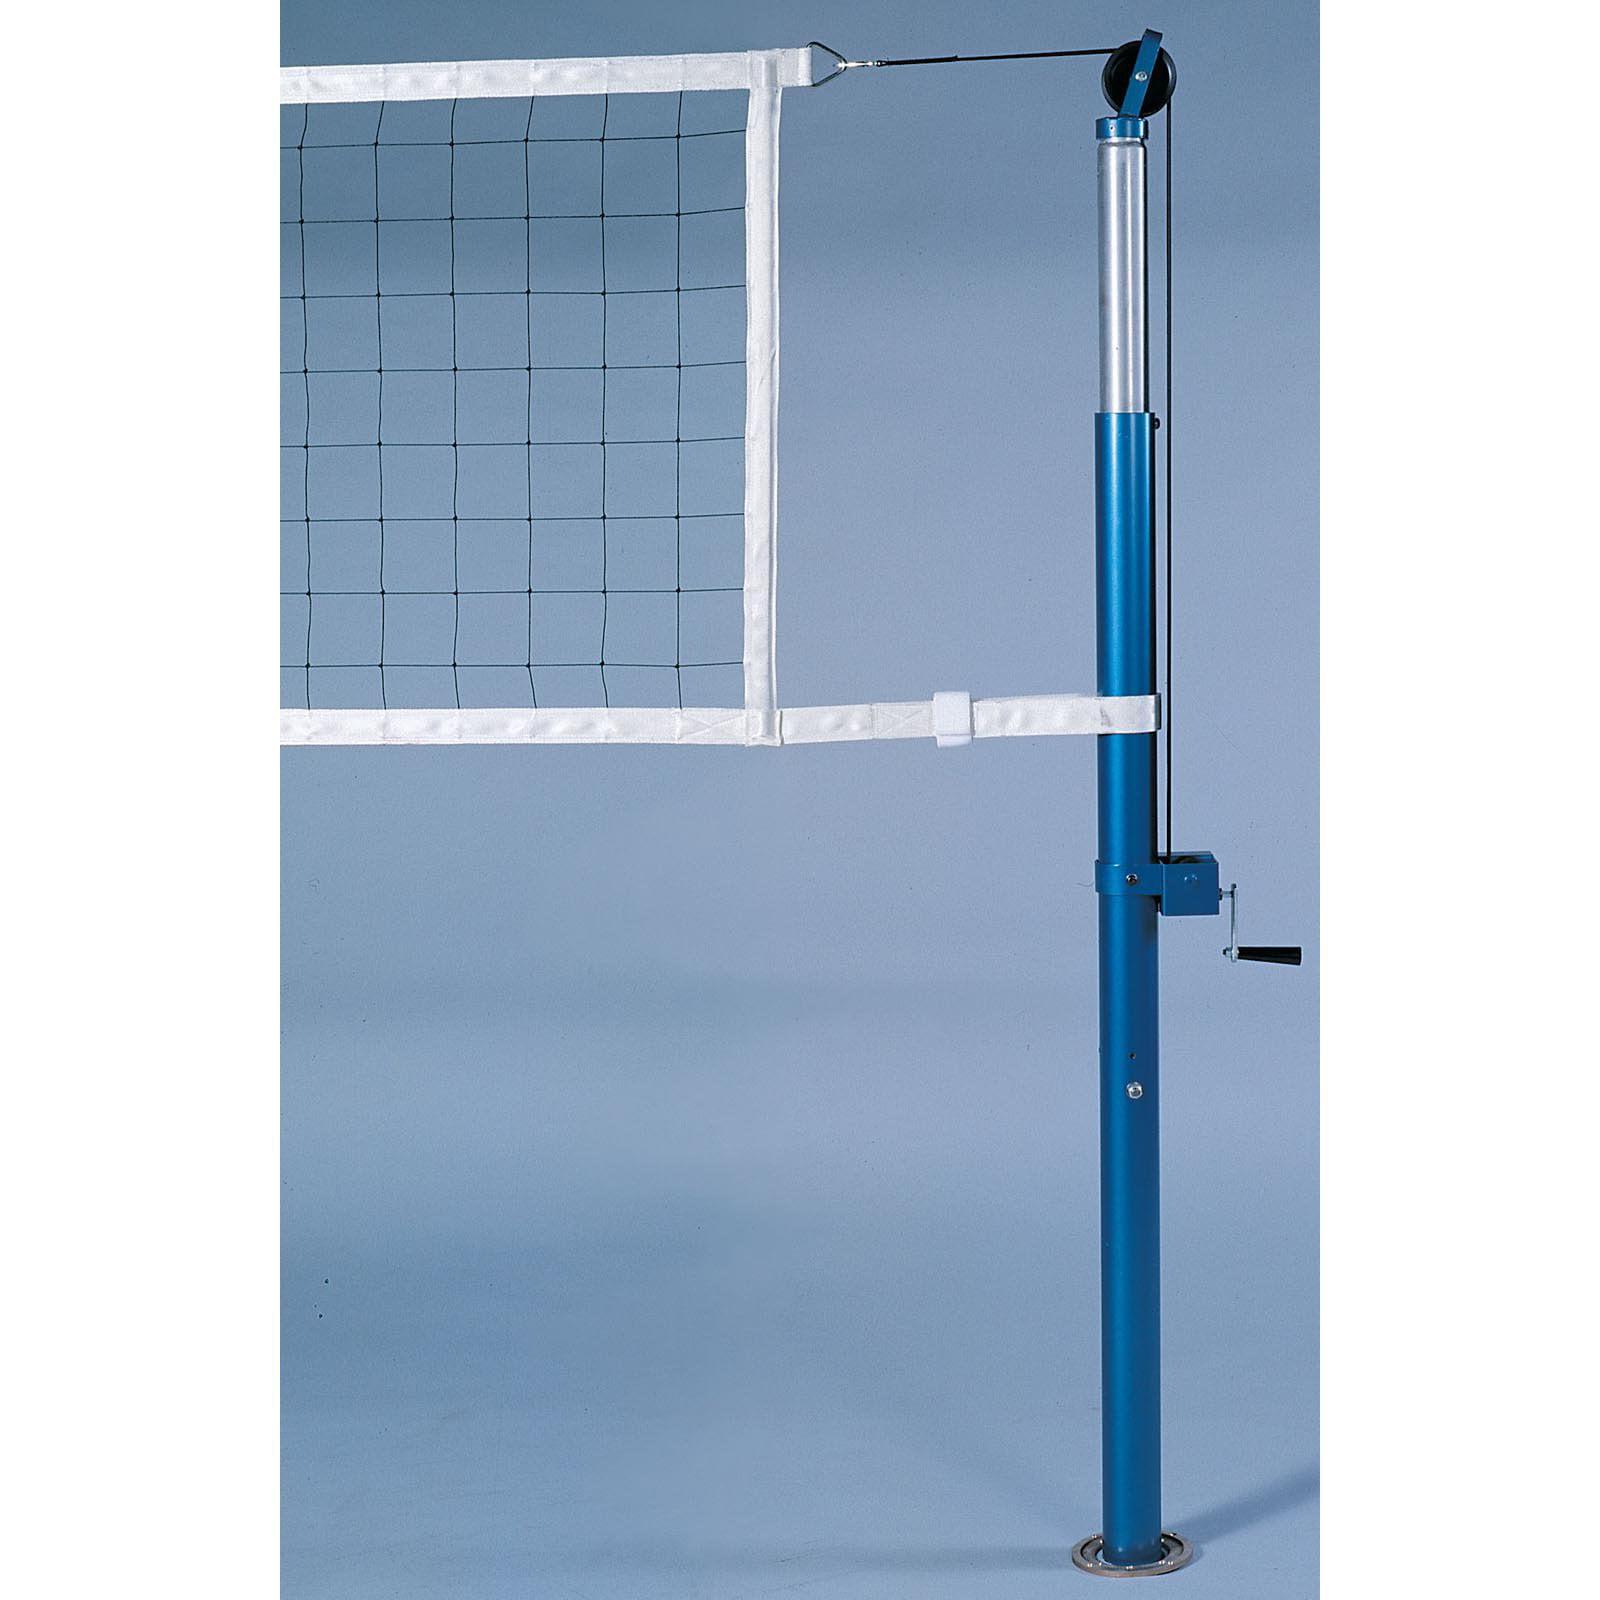 Jaypro 3 Inch Powerlite International Volleyball Net System by Jaypro Sports LLC